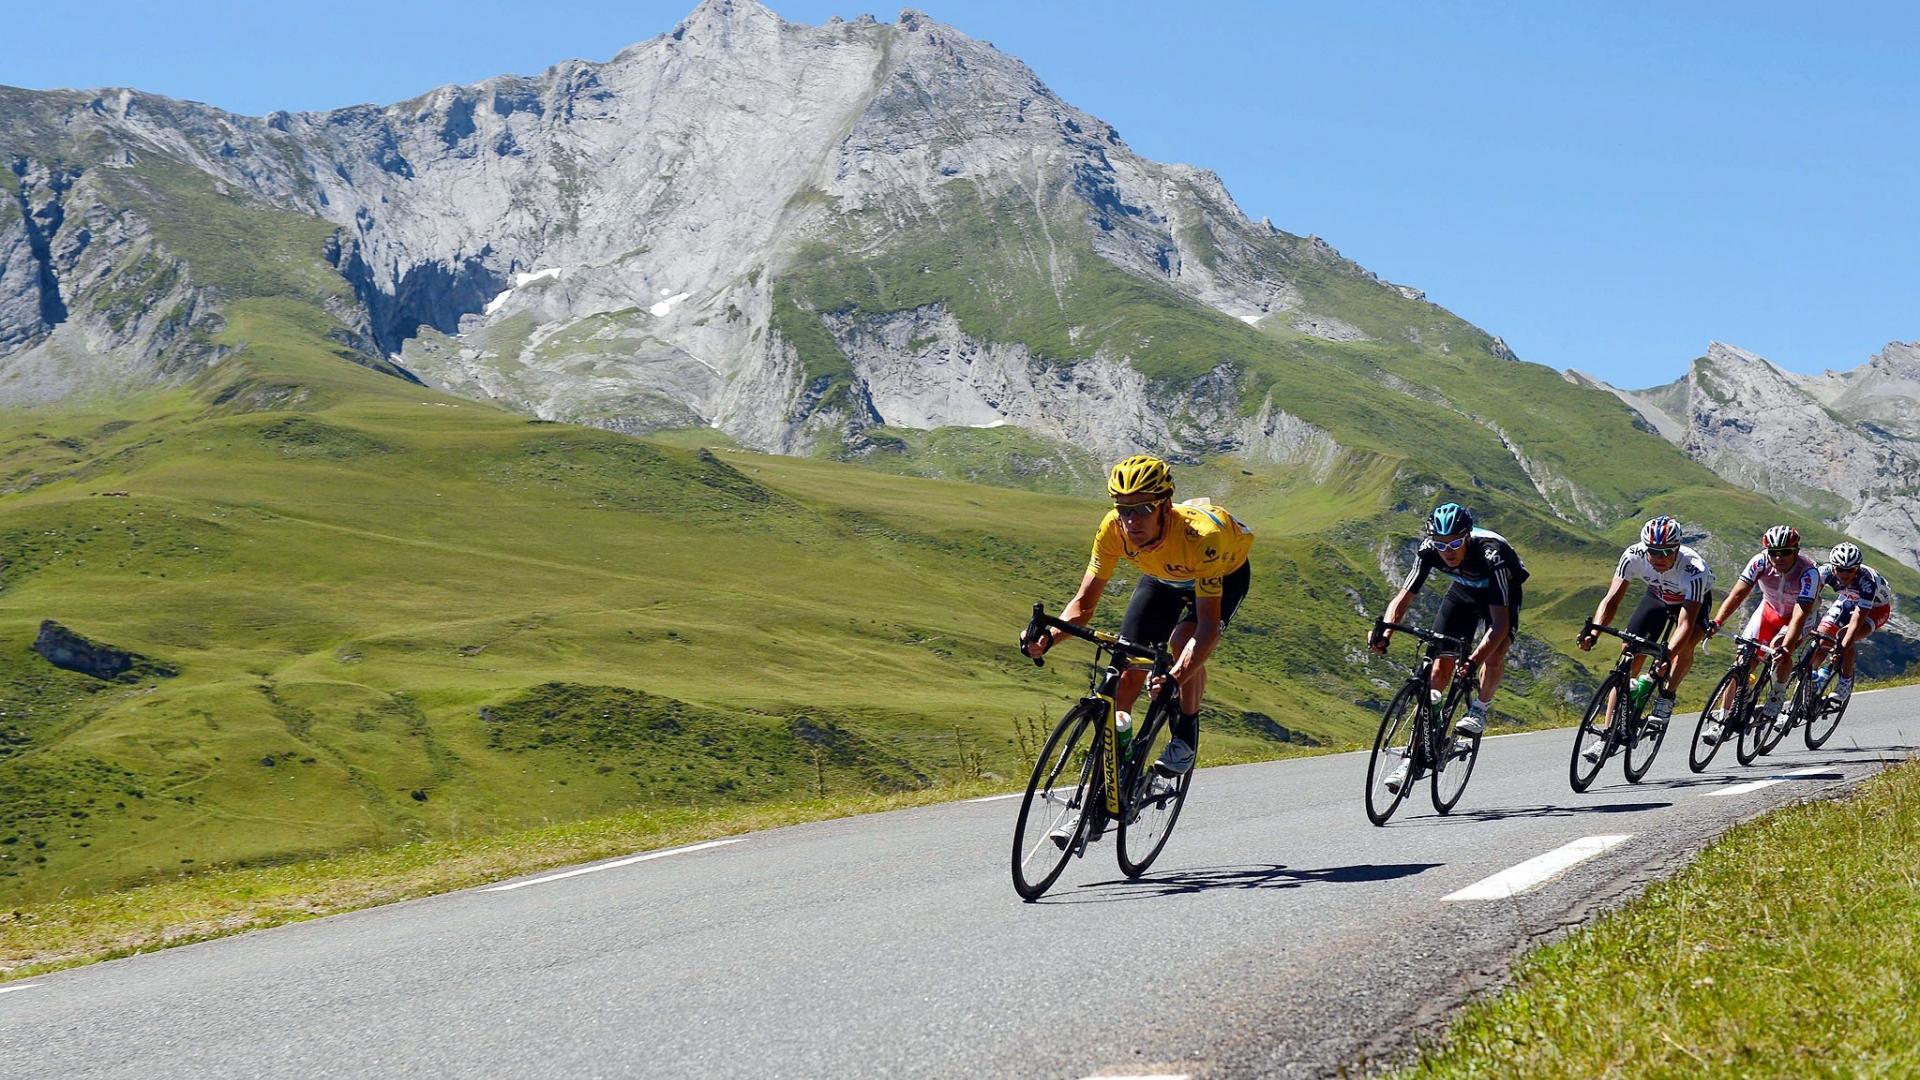 Cycling Wallpaper - WallpaperSafari